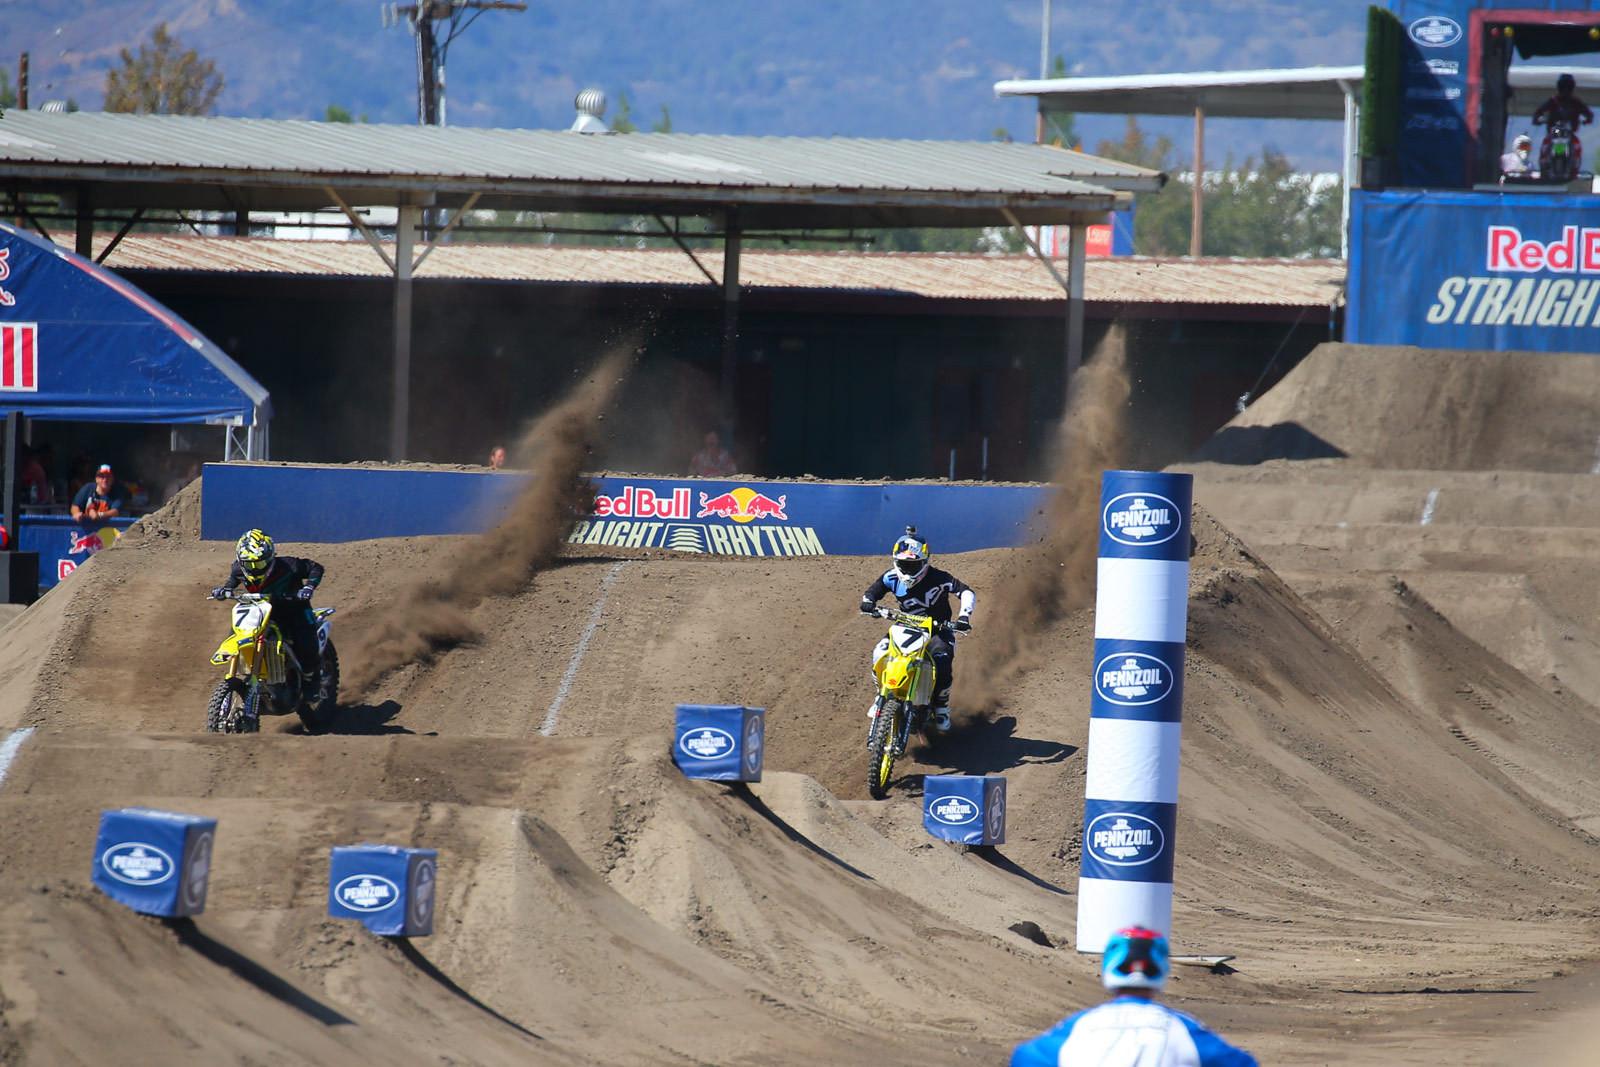 Nick Schmidt and James Stewart - Photo Blast: Red Bull Straight Rhythm - Motocross Pictures - Vital MX